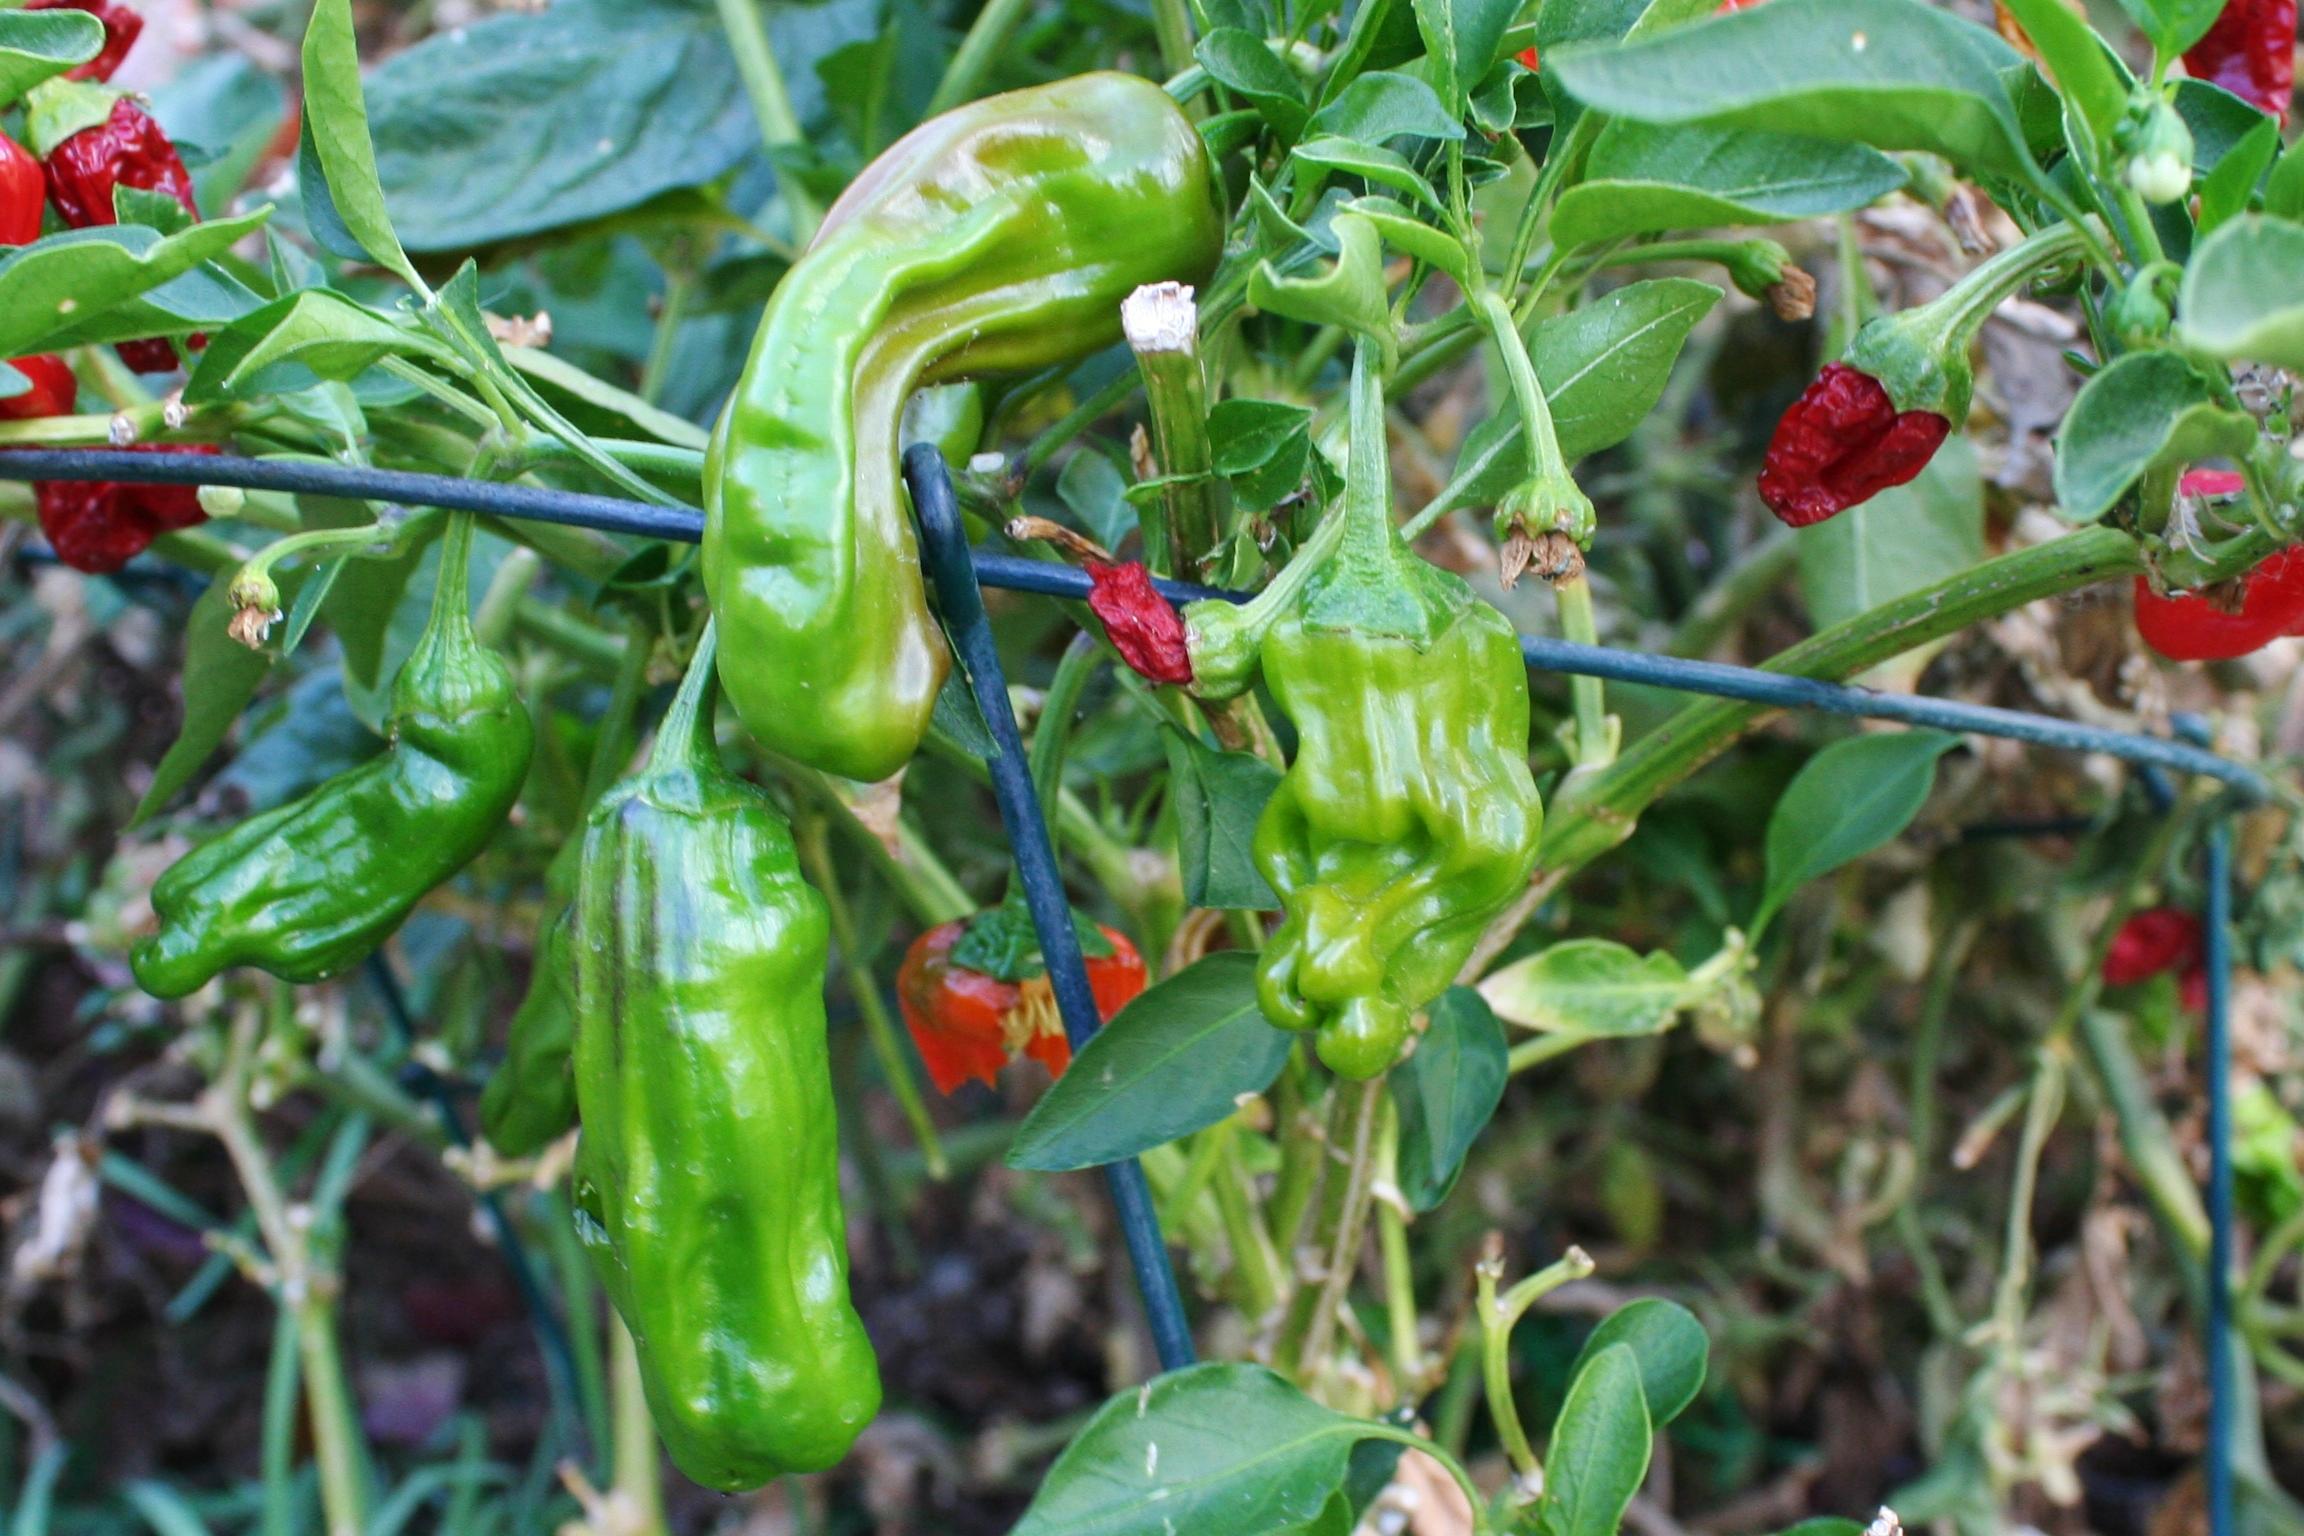 Shishito peppers Arizona